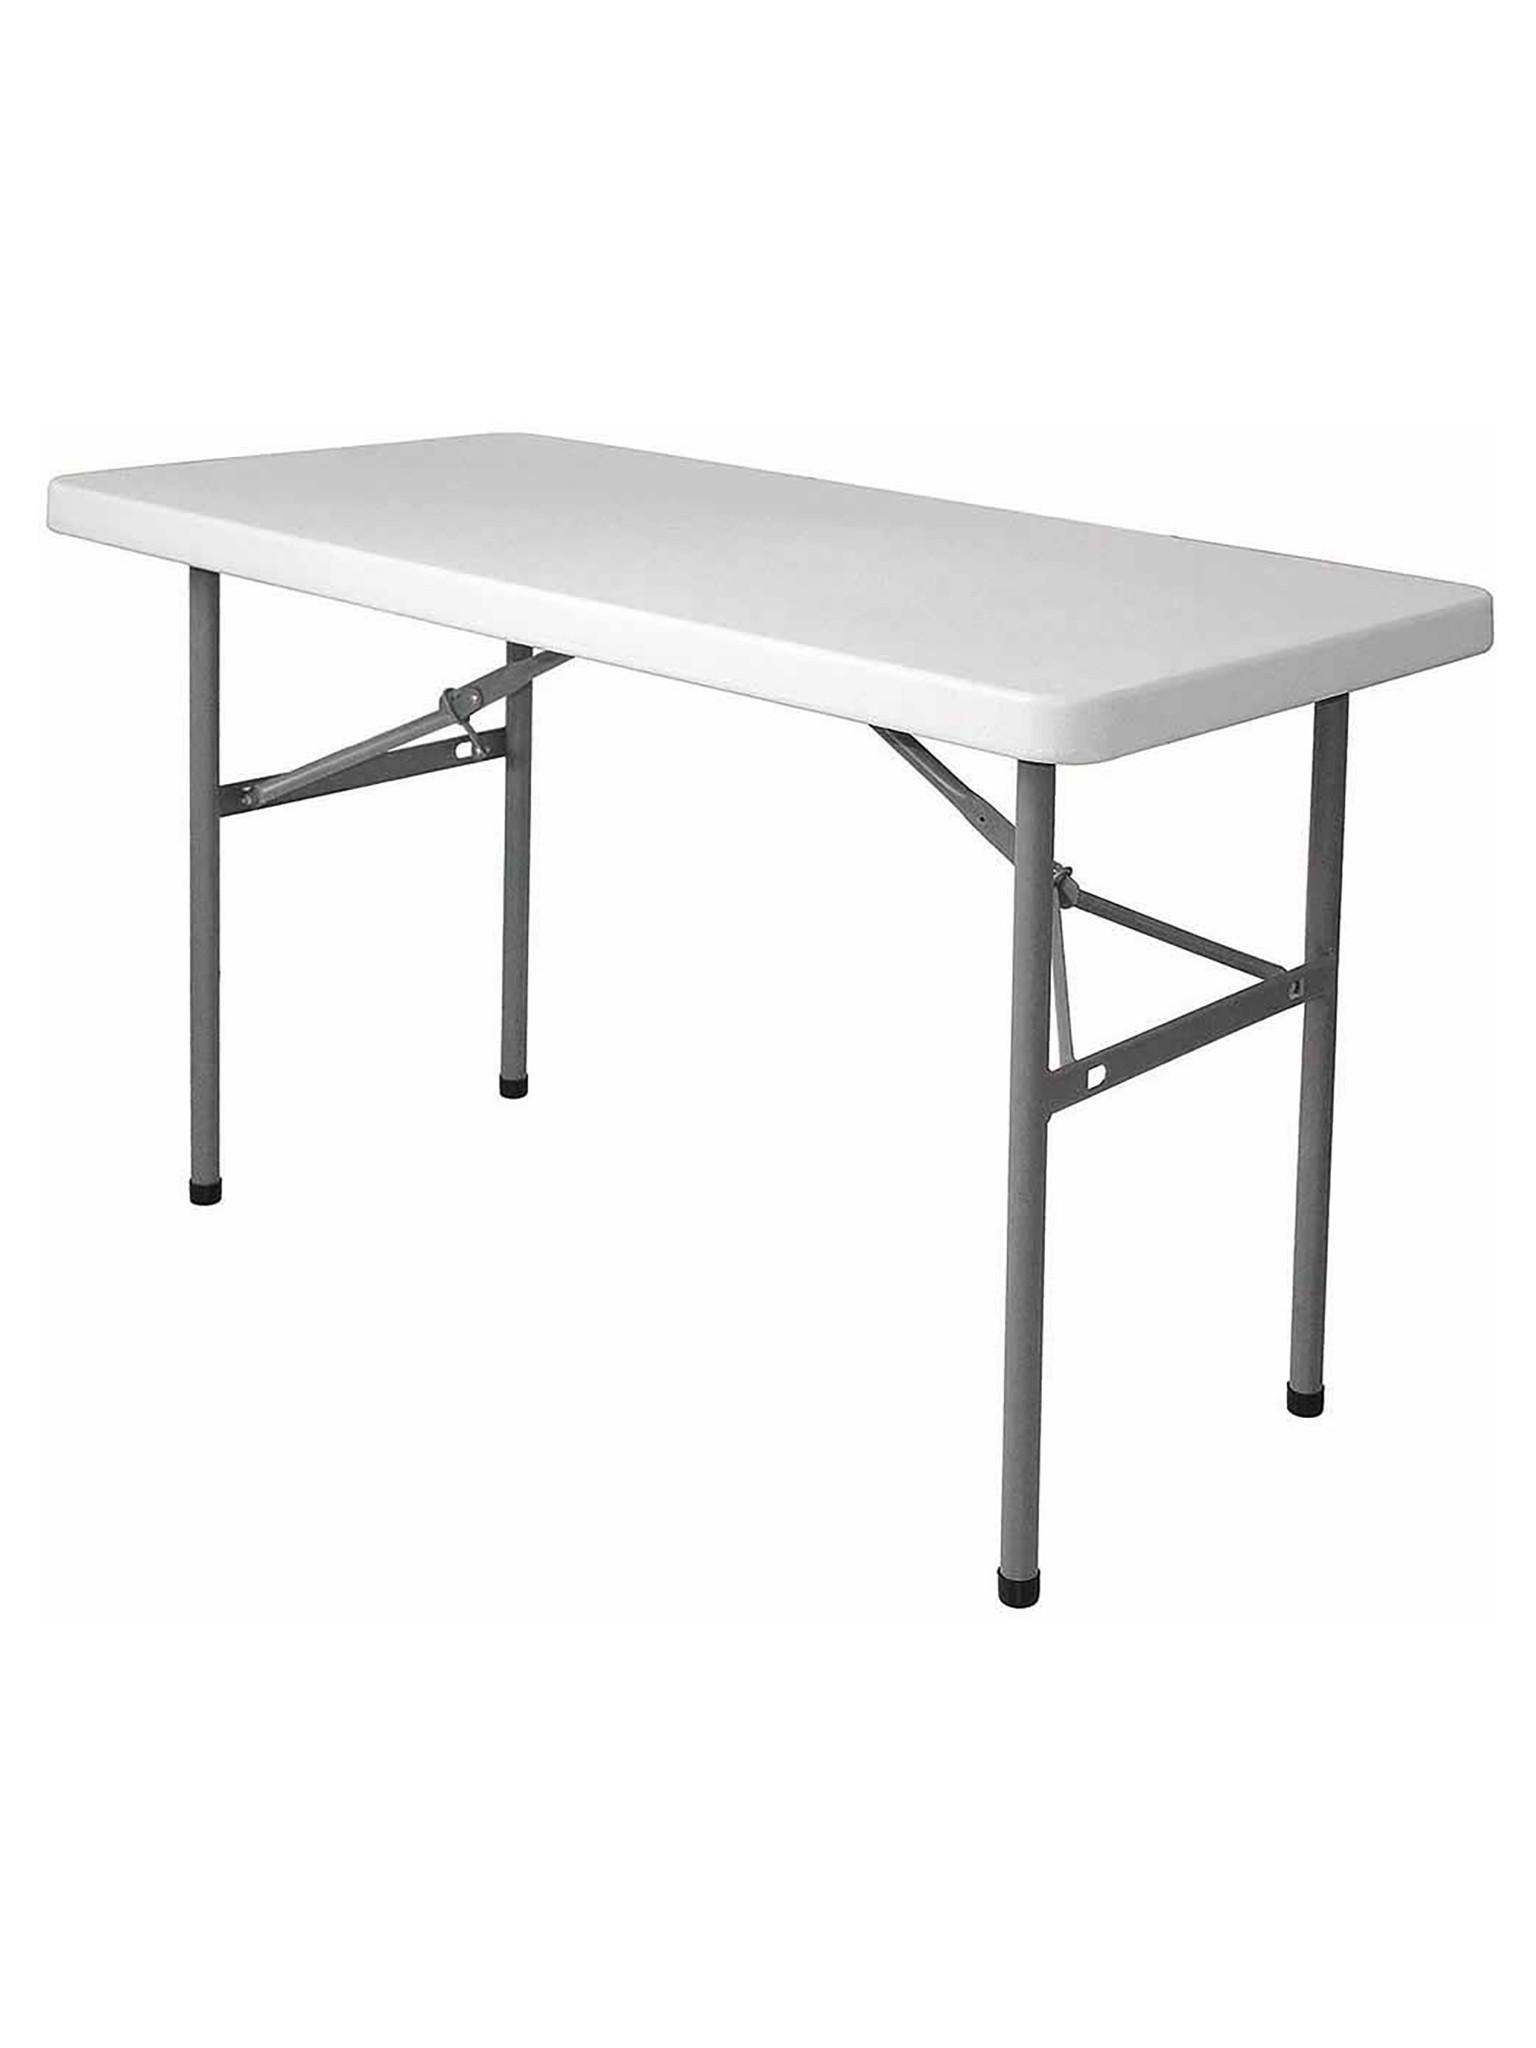 Inklapbare tafel - Rechthoek - H 74 x 122 x 61 CM - Promoline